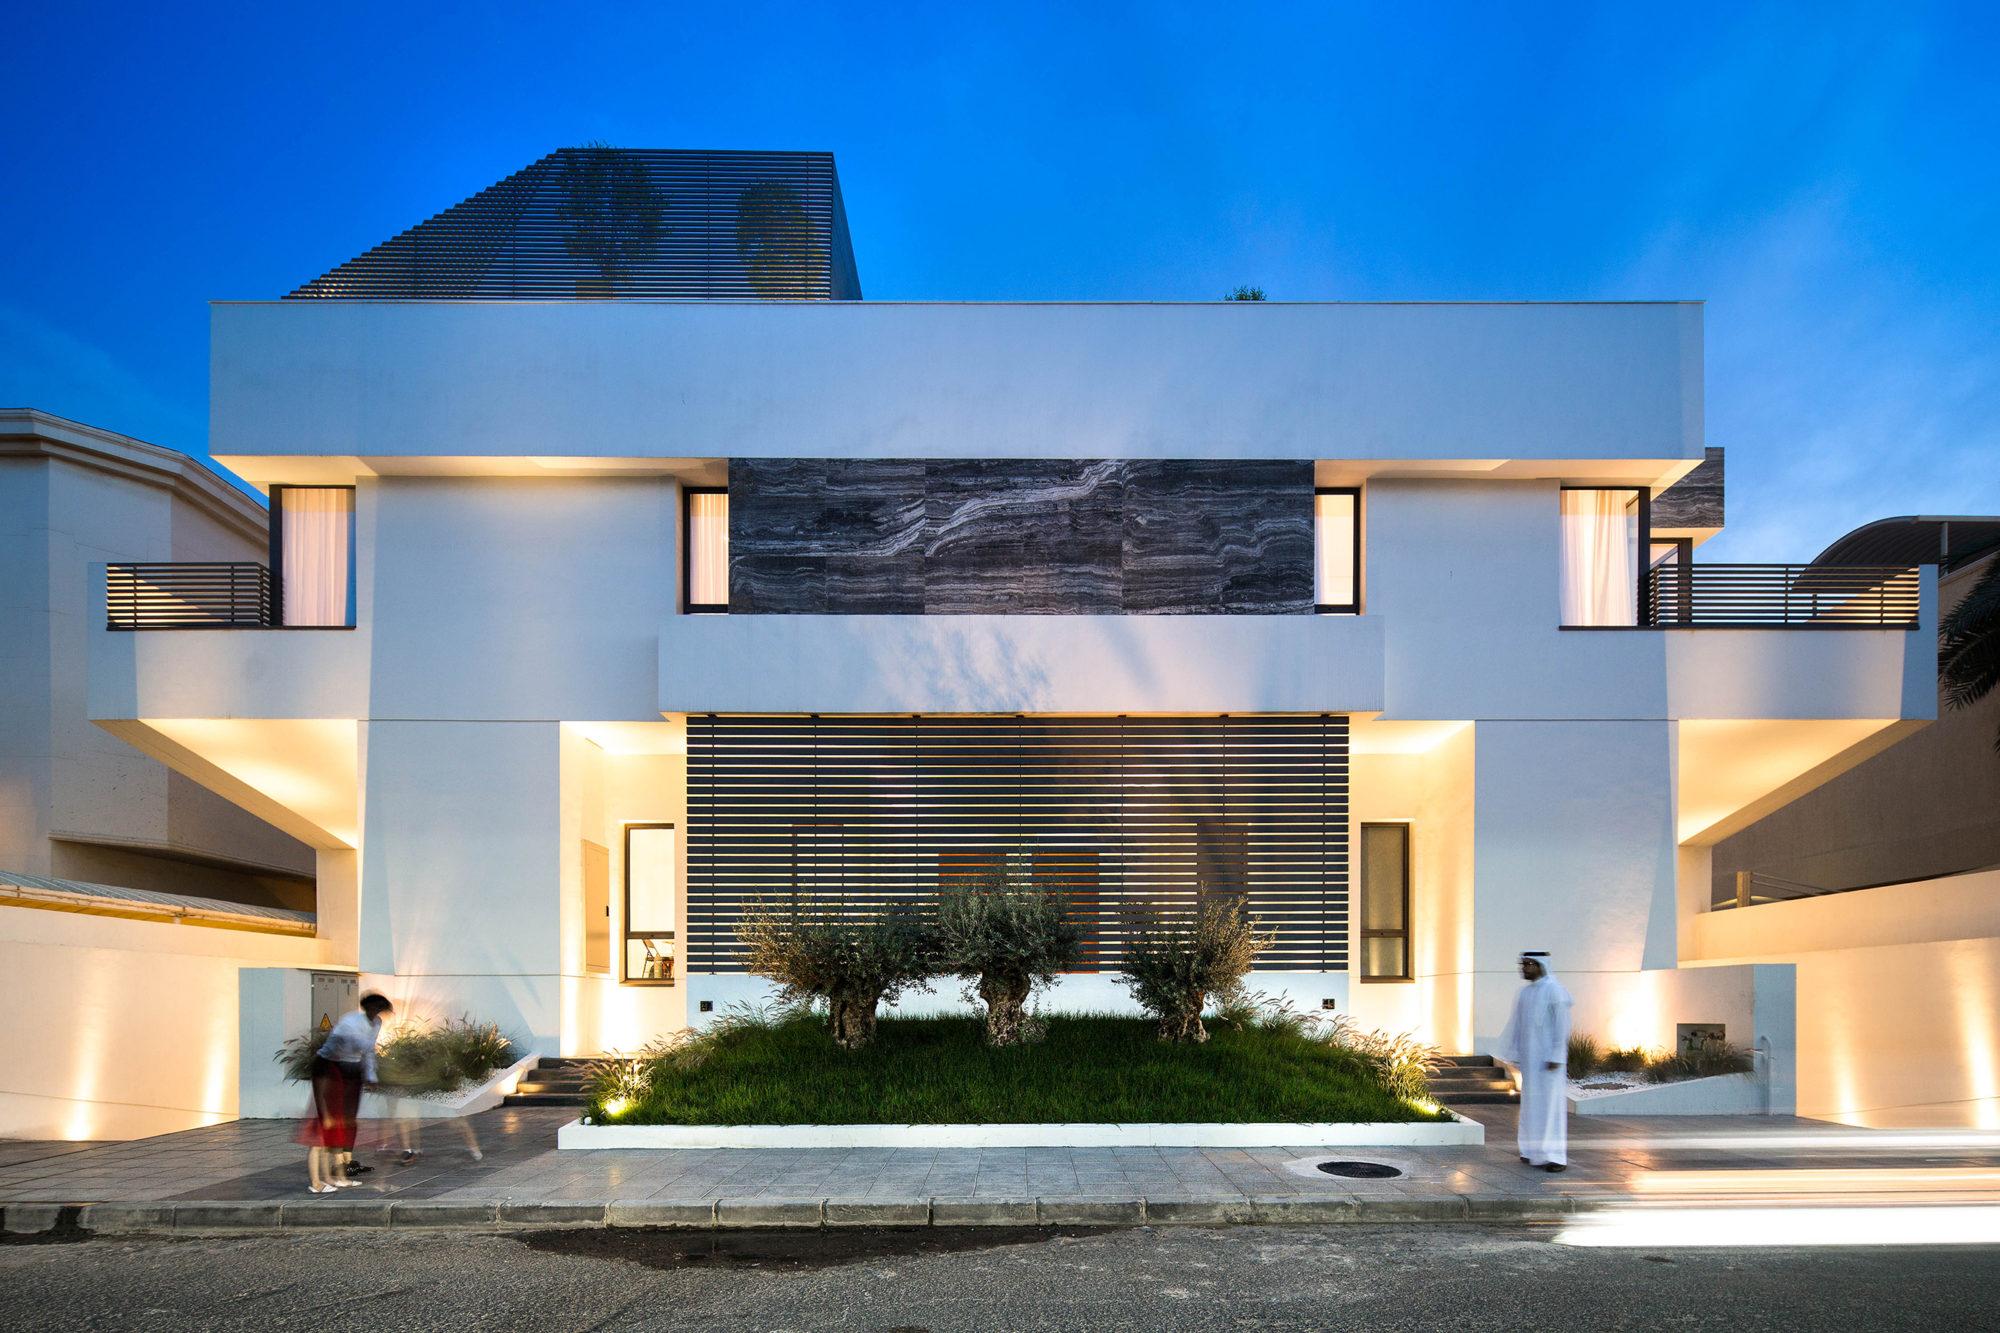 HOUSE IN YARMOUK